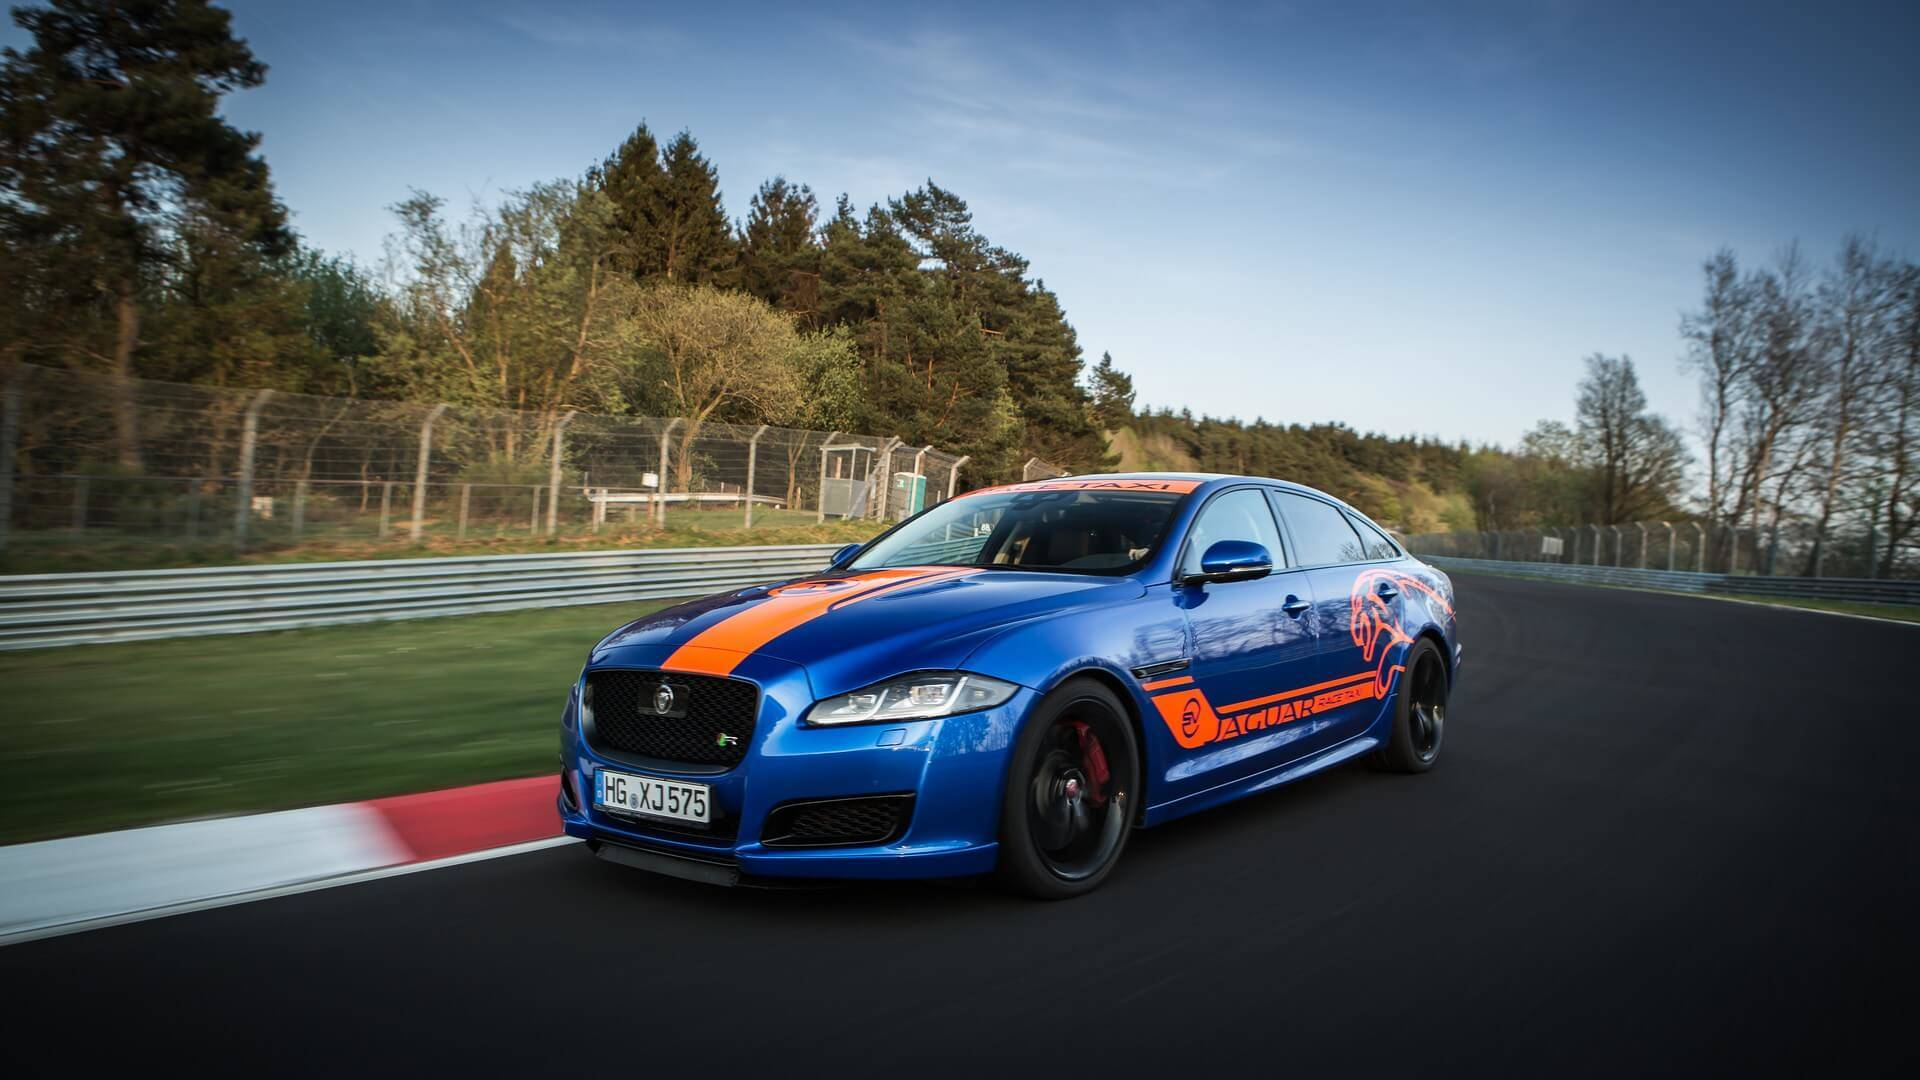 Jaguar_Nurburgring_taxi_0006